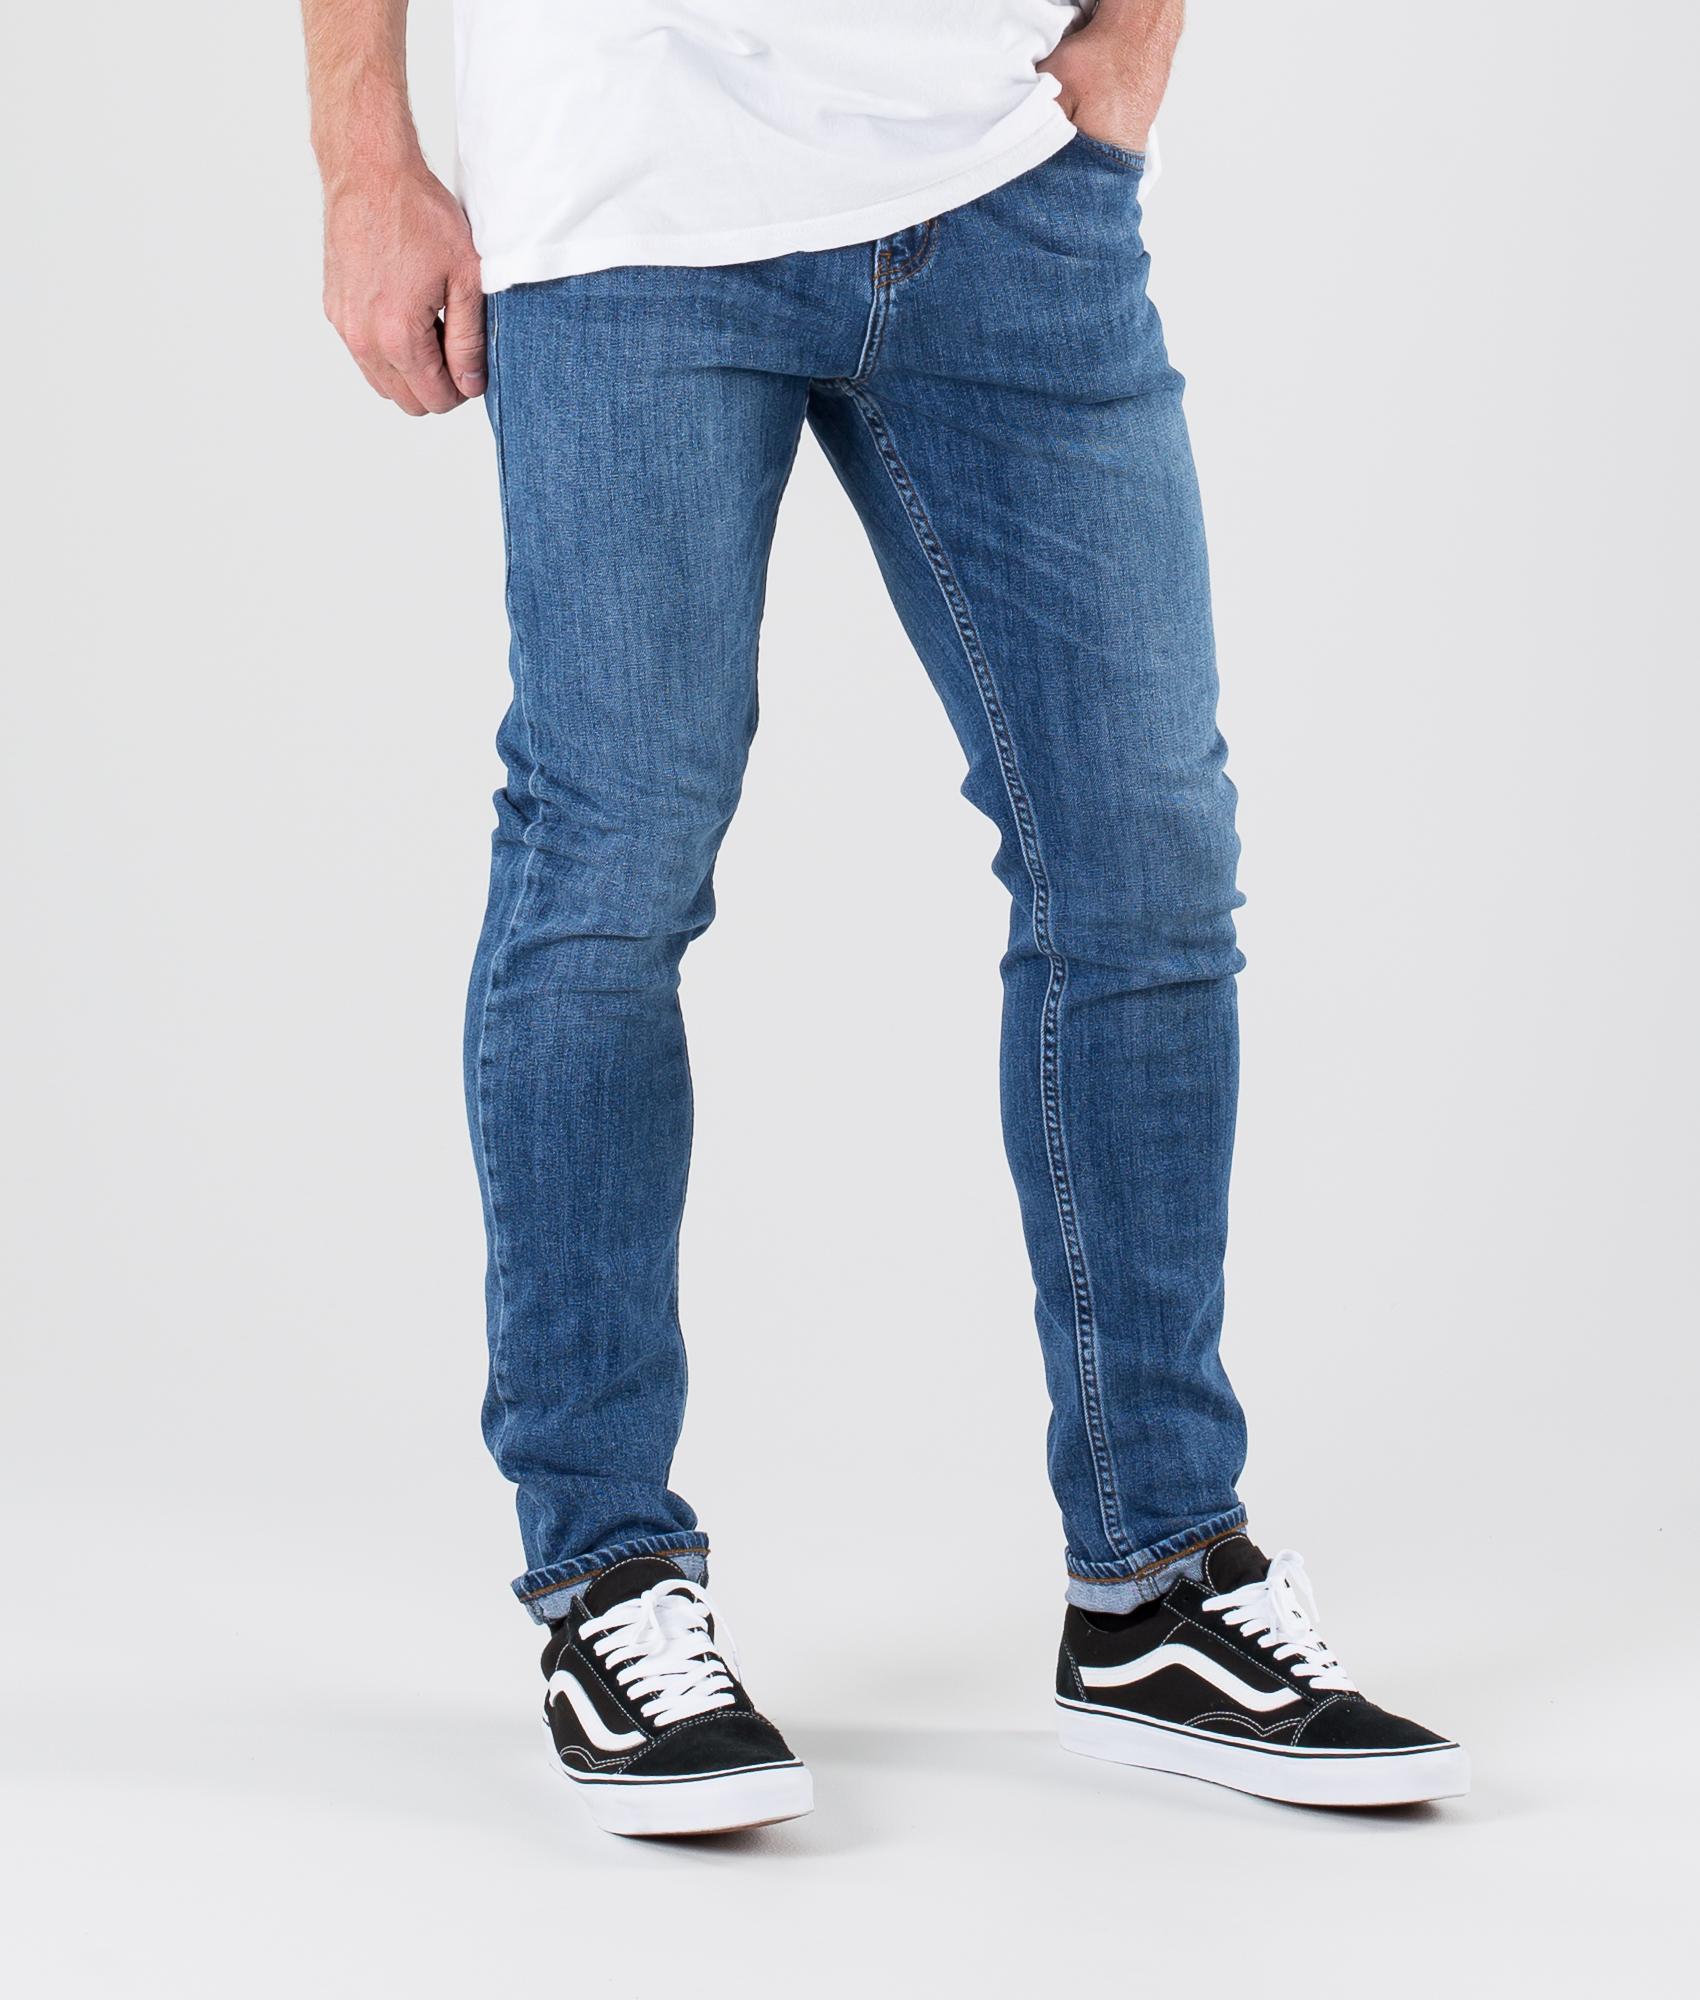 Gratuite StreetwearLivraison Homme Pantalon Pantalon Ridestore OP0wkn8